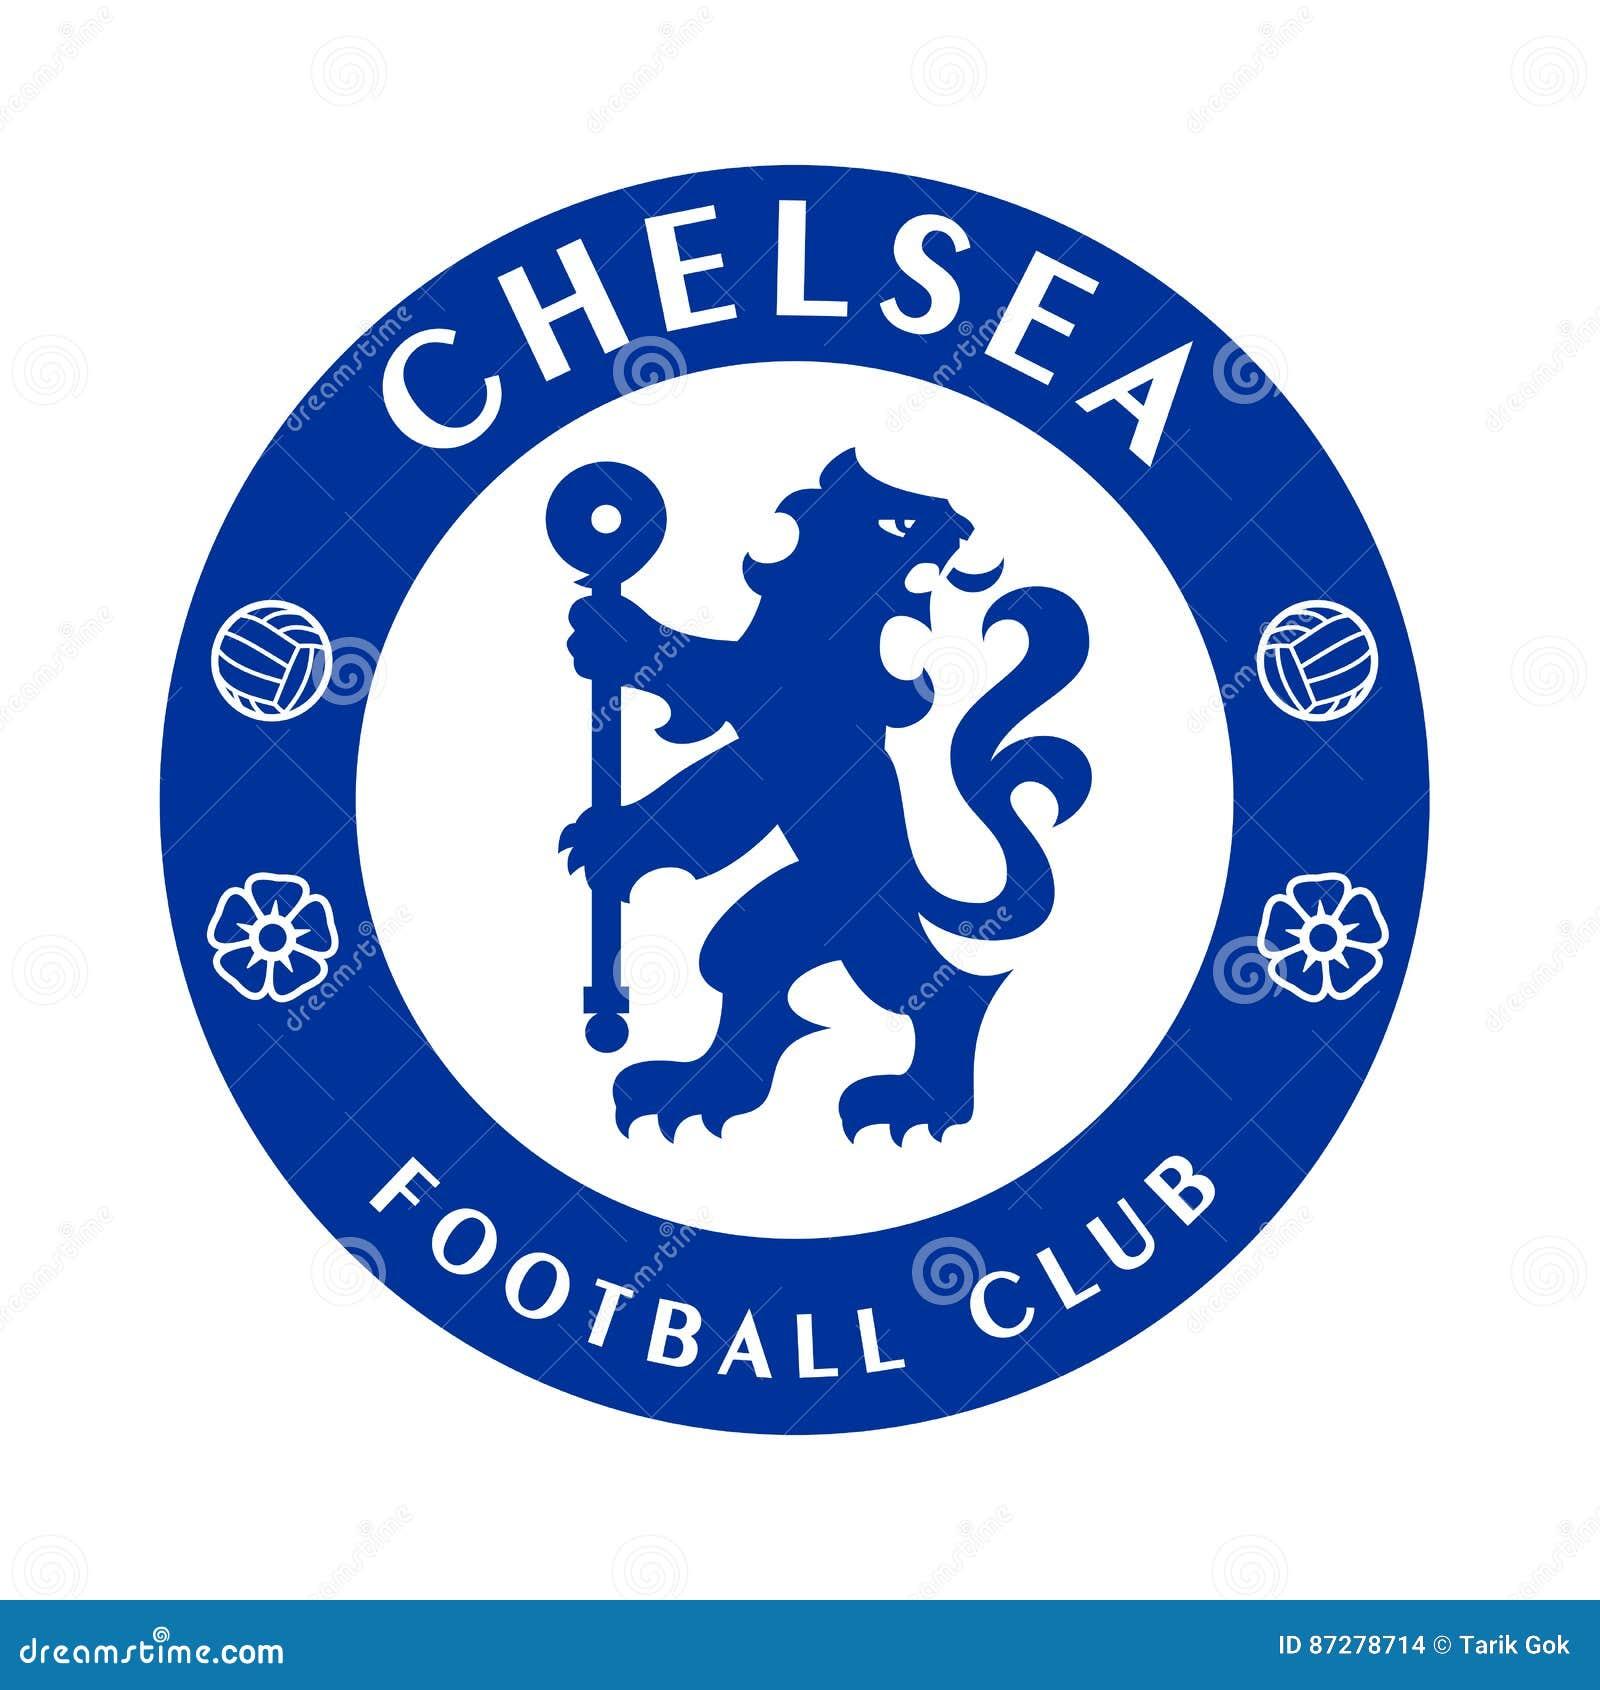 Chelsea F.C. Editorial Stock Image. Illustration Of Club